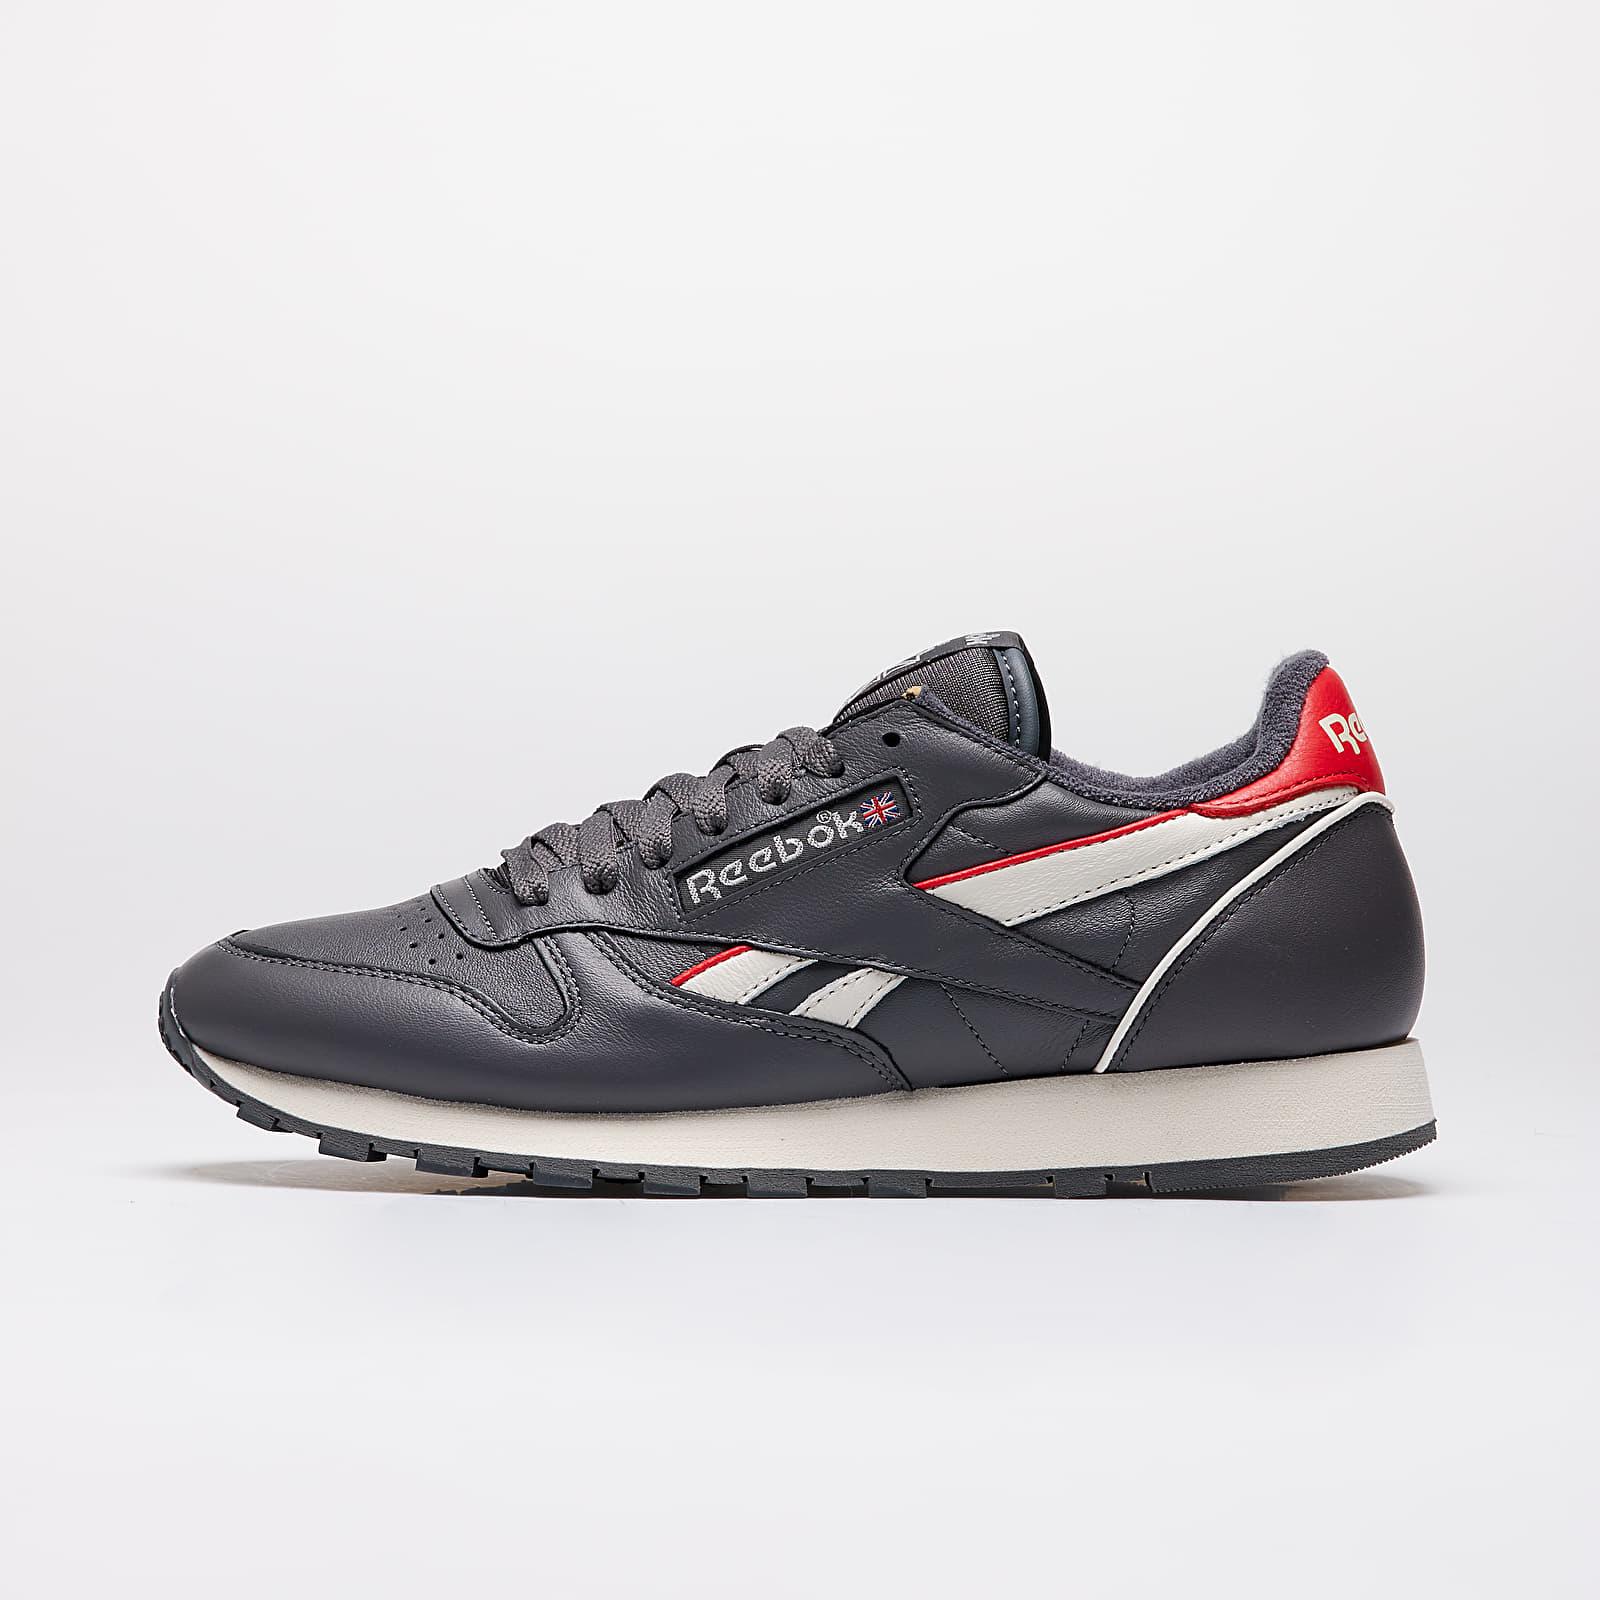 Men's shoes Reebok Classic Leather MU True Grey 7/ Chalk / Radiate Red